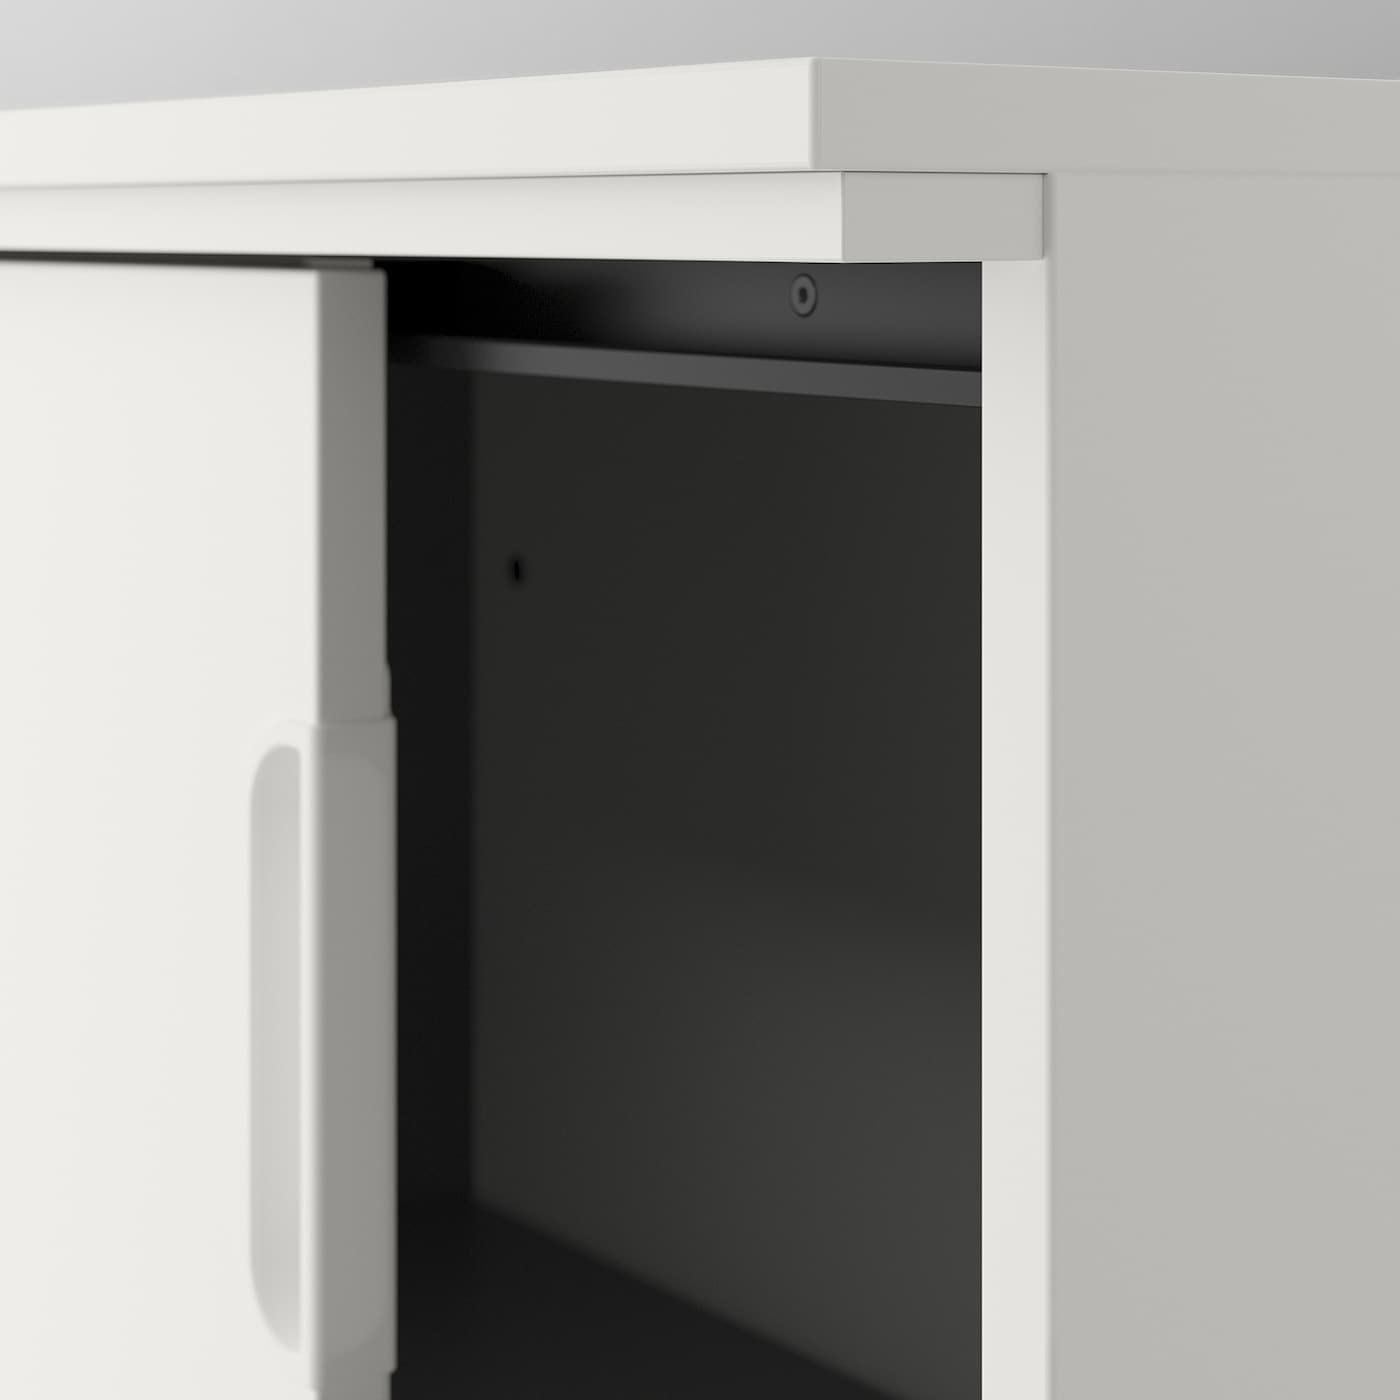 Galant Cabinet With Sliding Doors White 63x47 1 4 Ikea